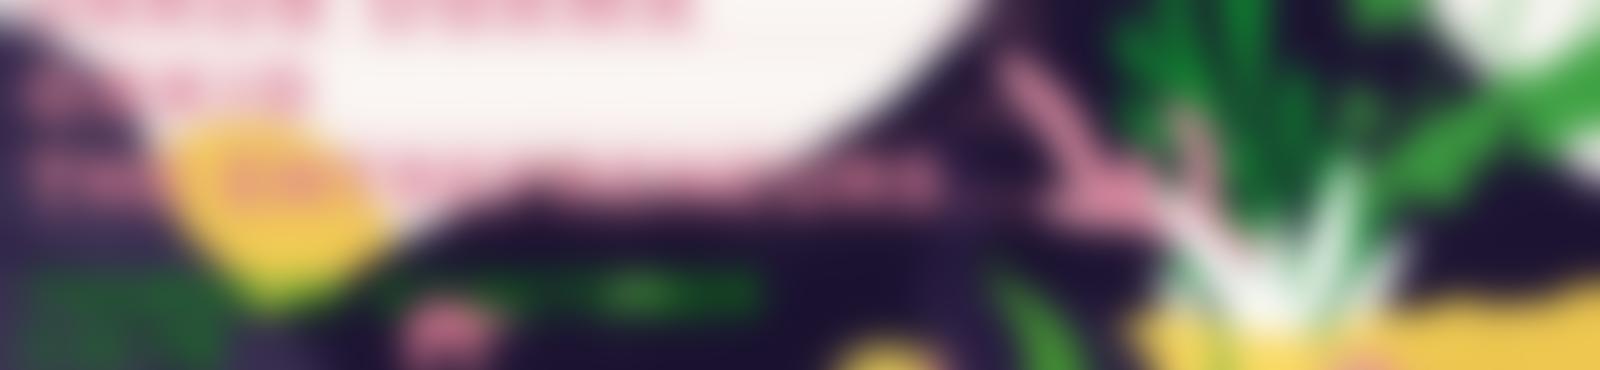 Blurred a2d238e3 4464 4fbc 8373 51cf64d83762